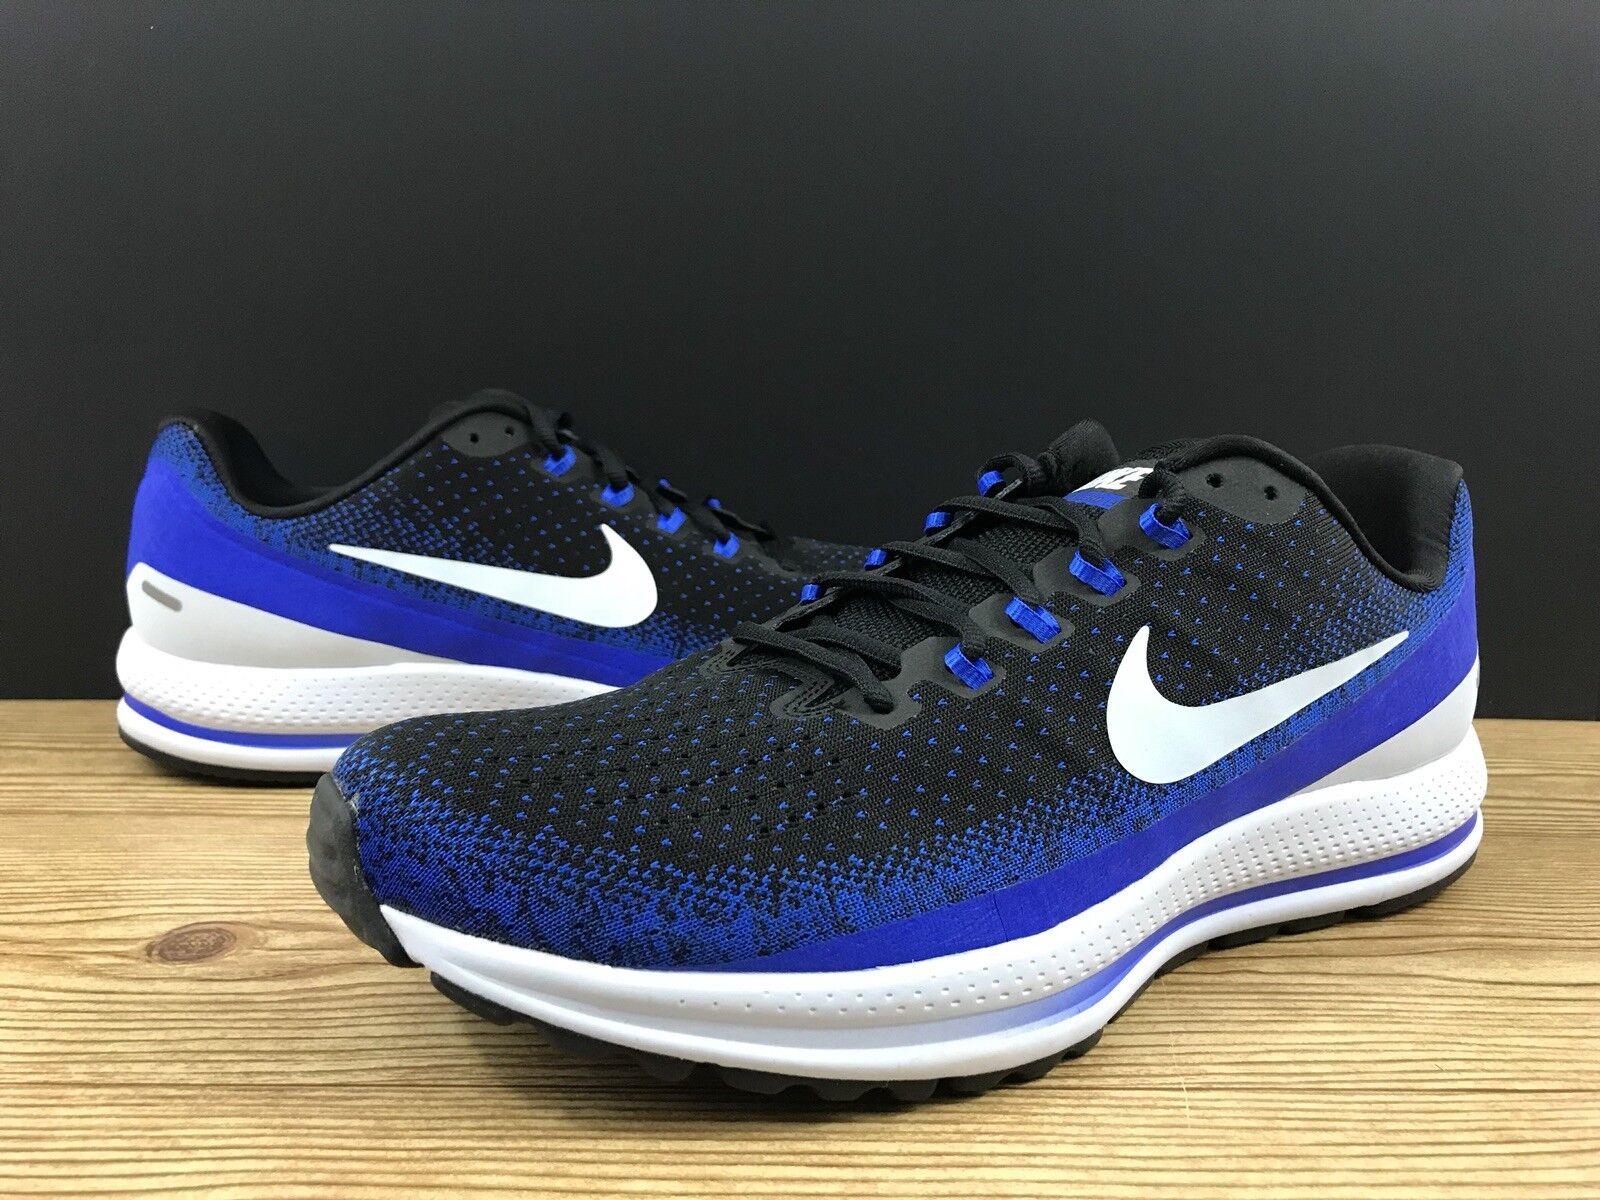 Nike Air Zoom Vomero 13 Men's Running shoes Sz 14 922908-002 Black Racer bluee